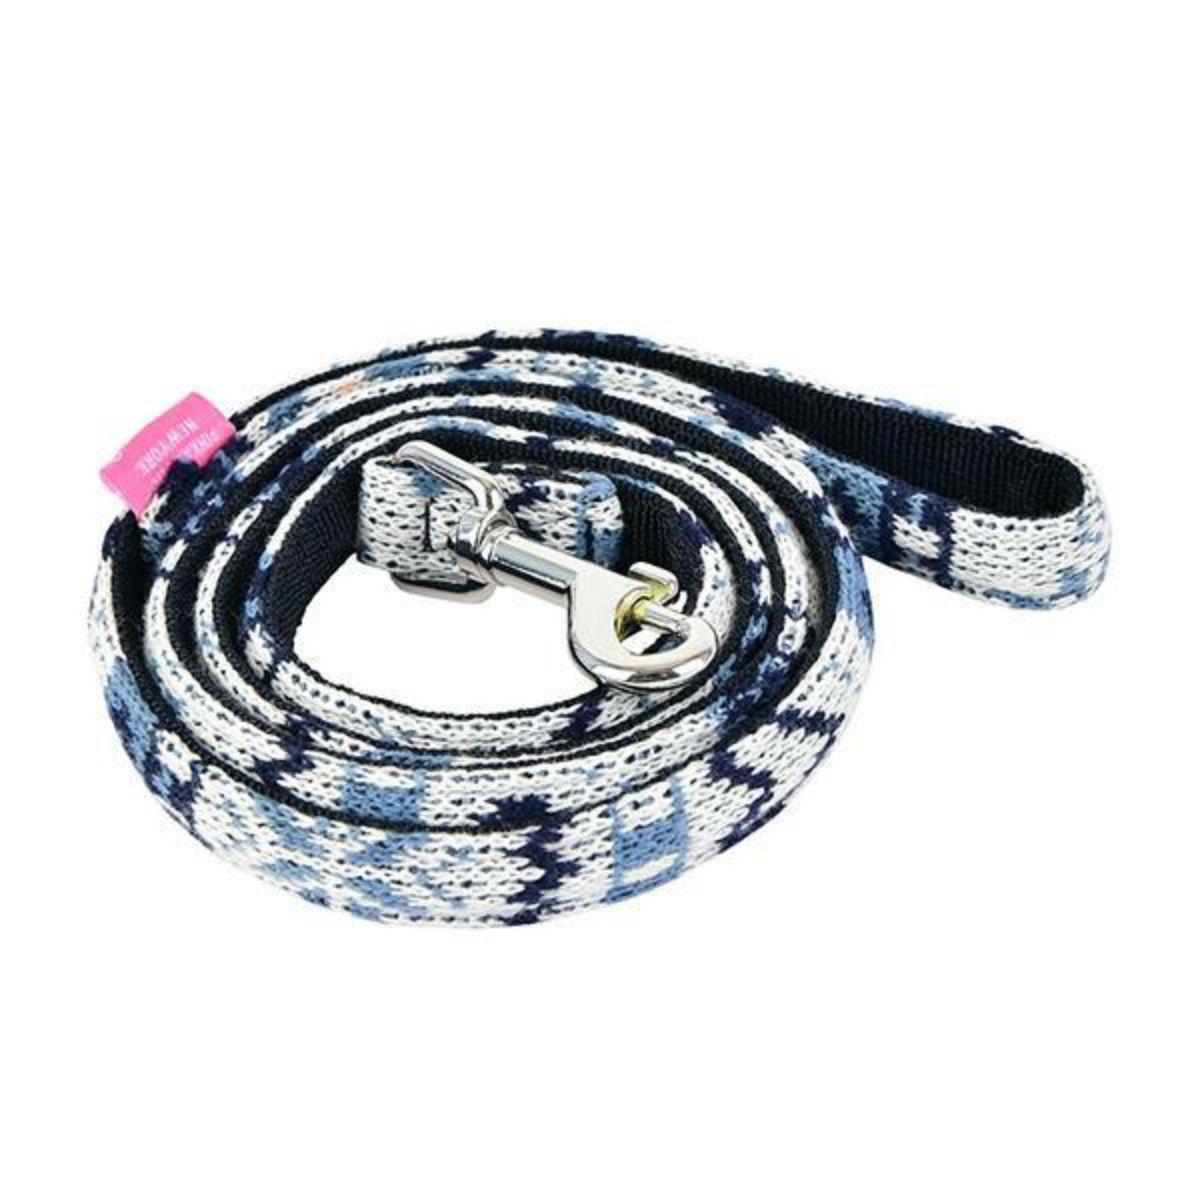 Joy Dog Leash by Pinkaholic - Navy